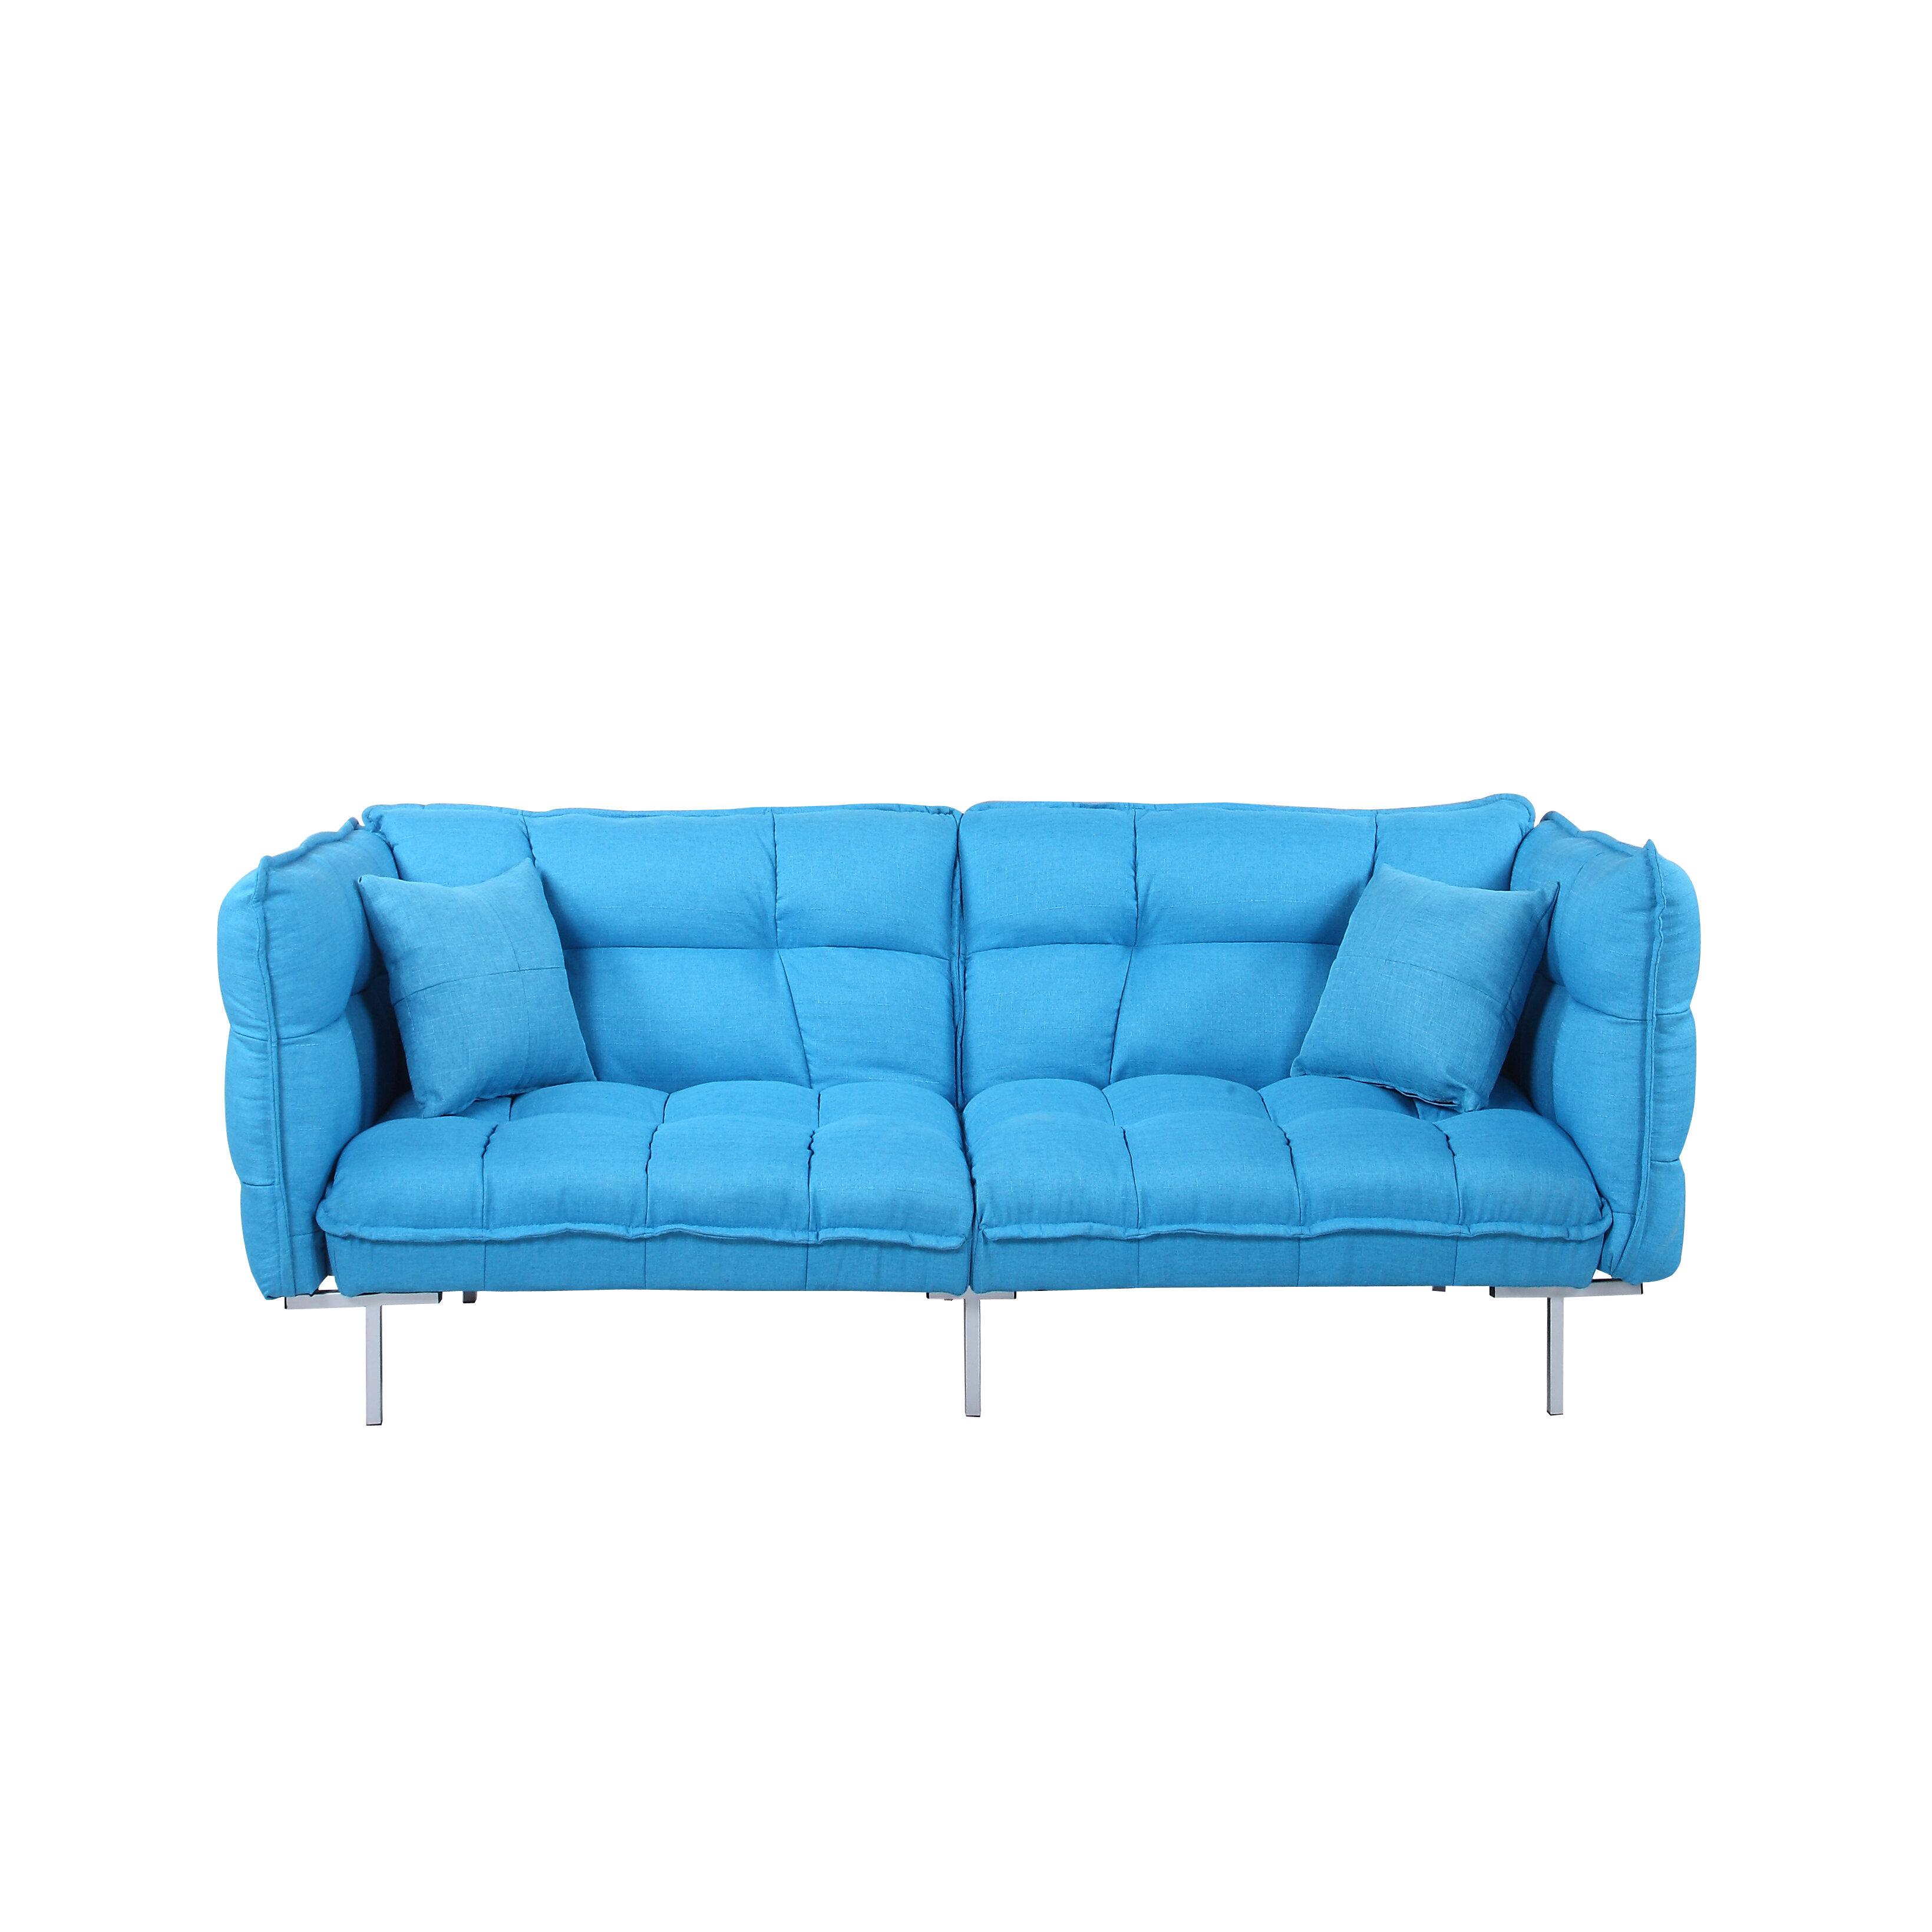 Madison Home Usa Modern Plush Tufted Linen Splitback Living Room Sleeper Sofa Reviews Wayfair